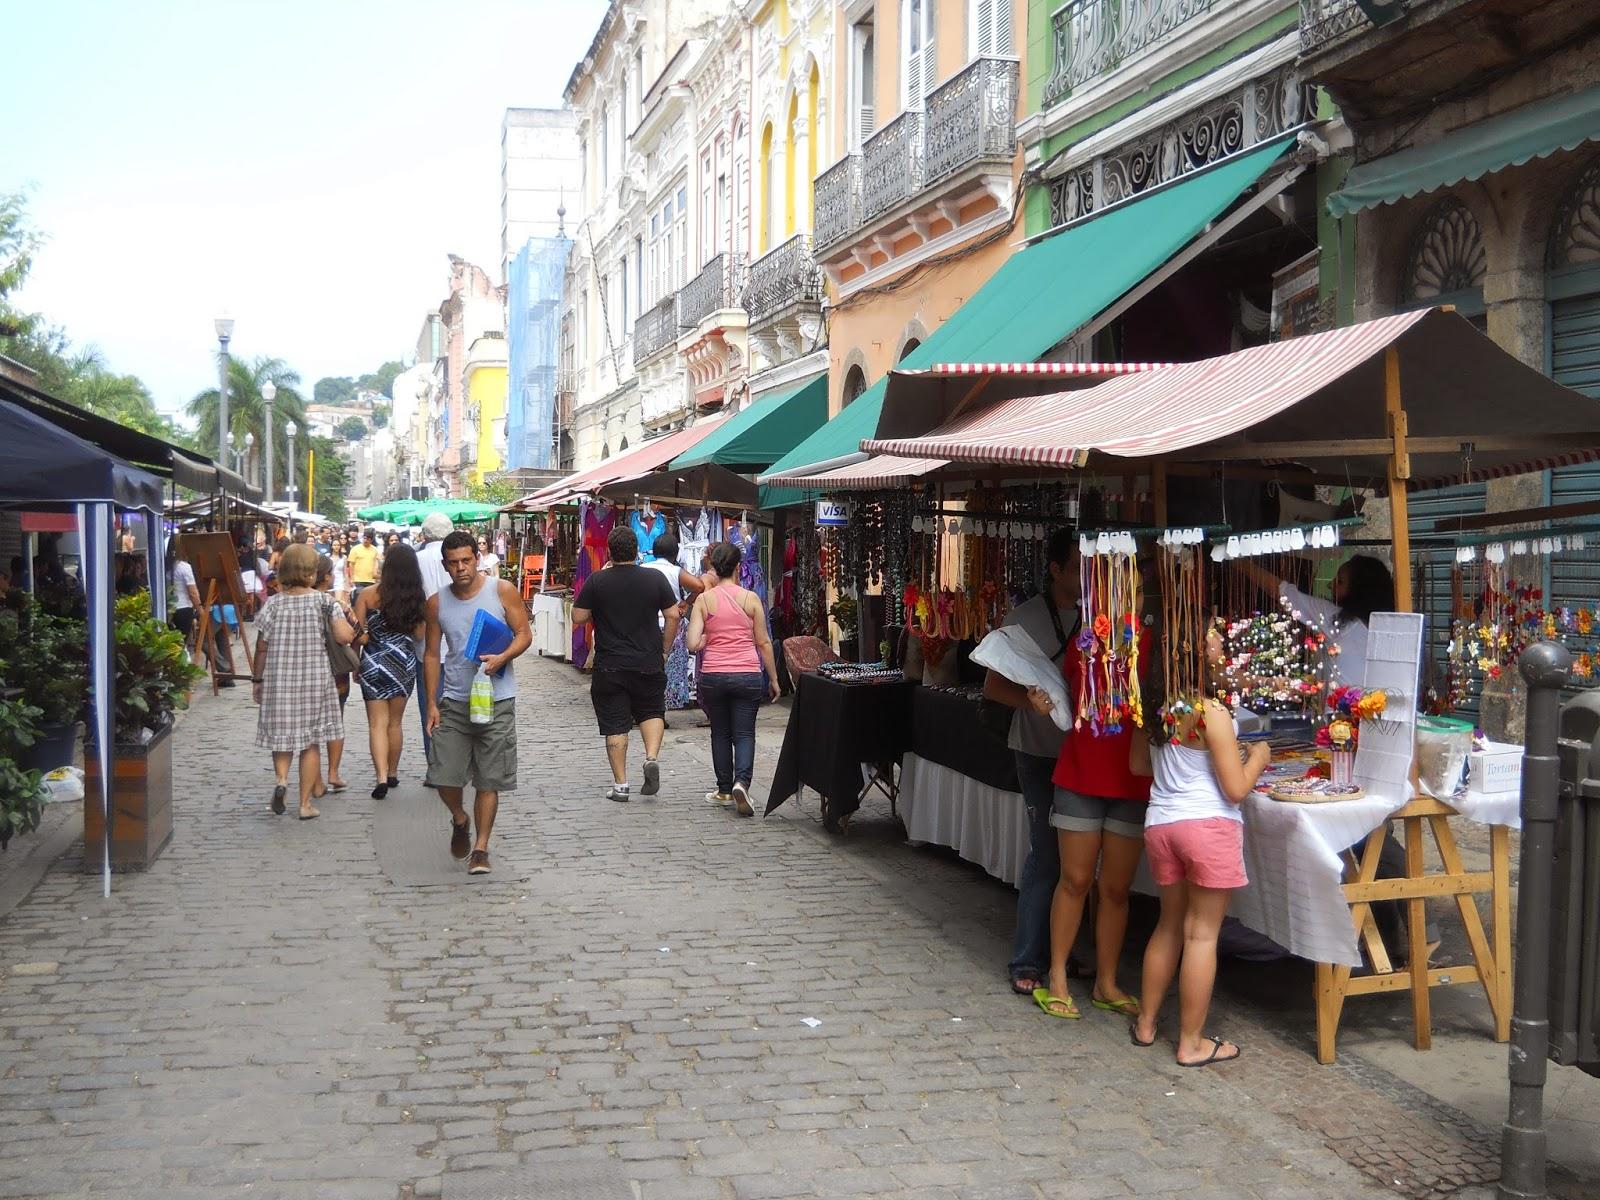 Feira de antiguidades do Lavradio, no Centro do Rio